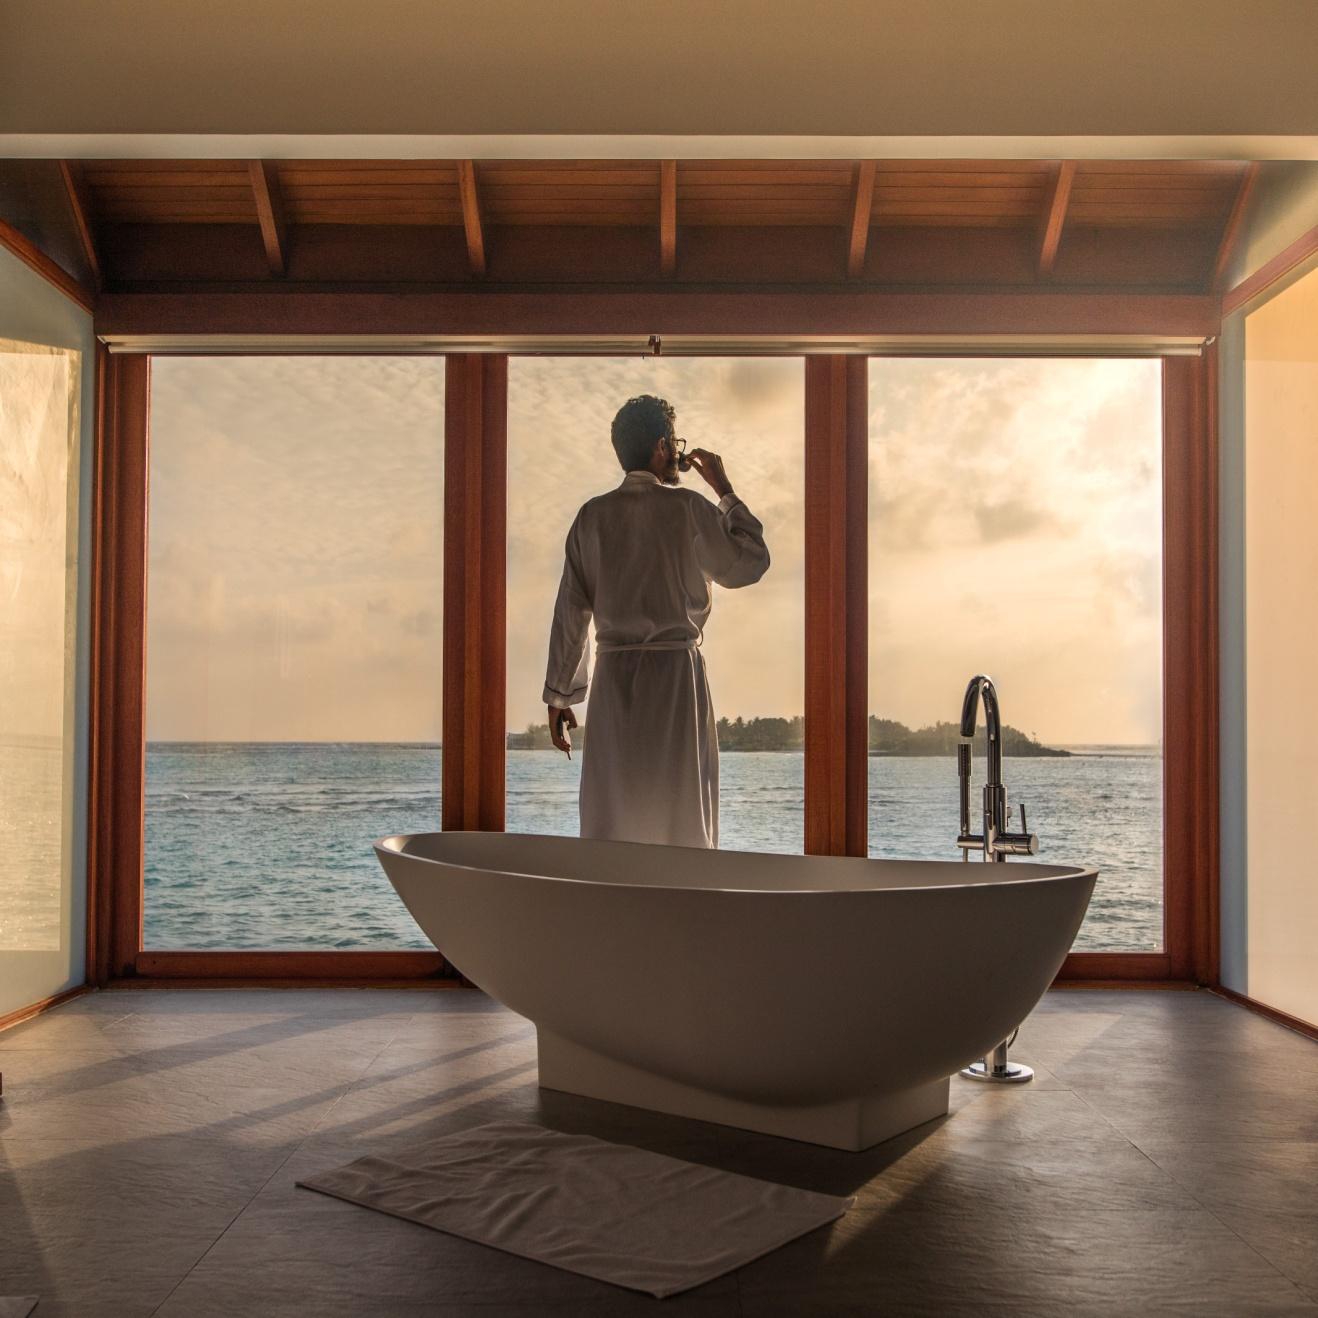 Money guarantees a luxurious lifestyle